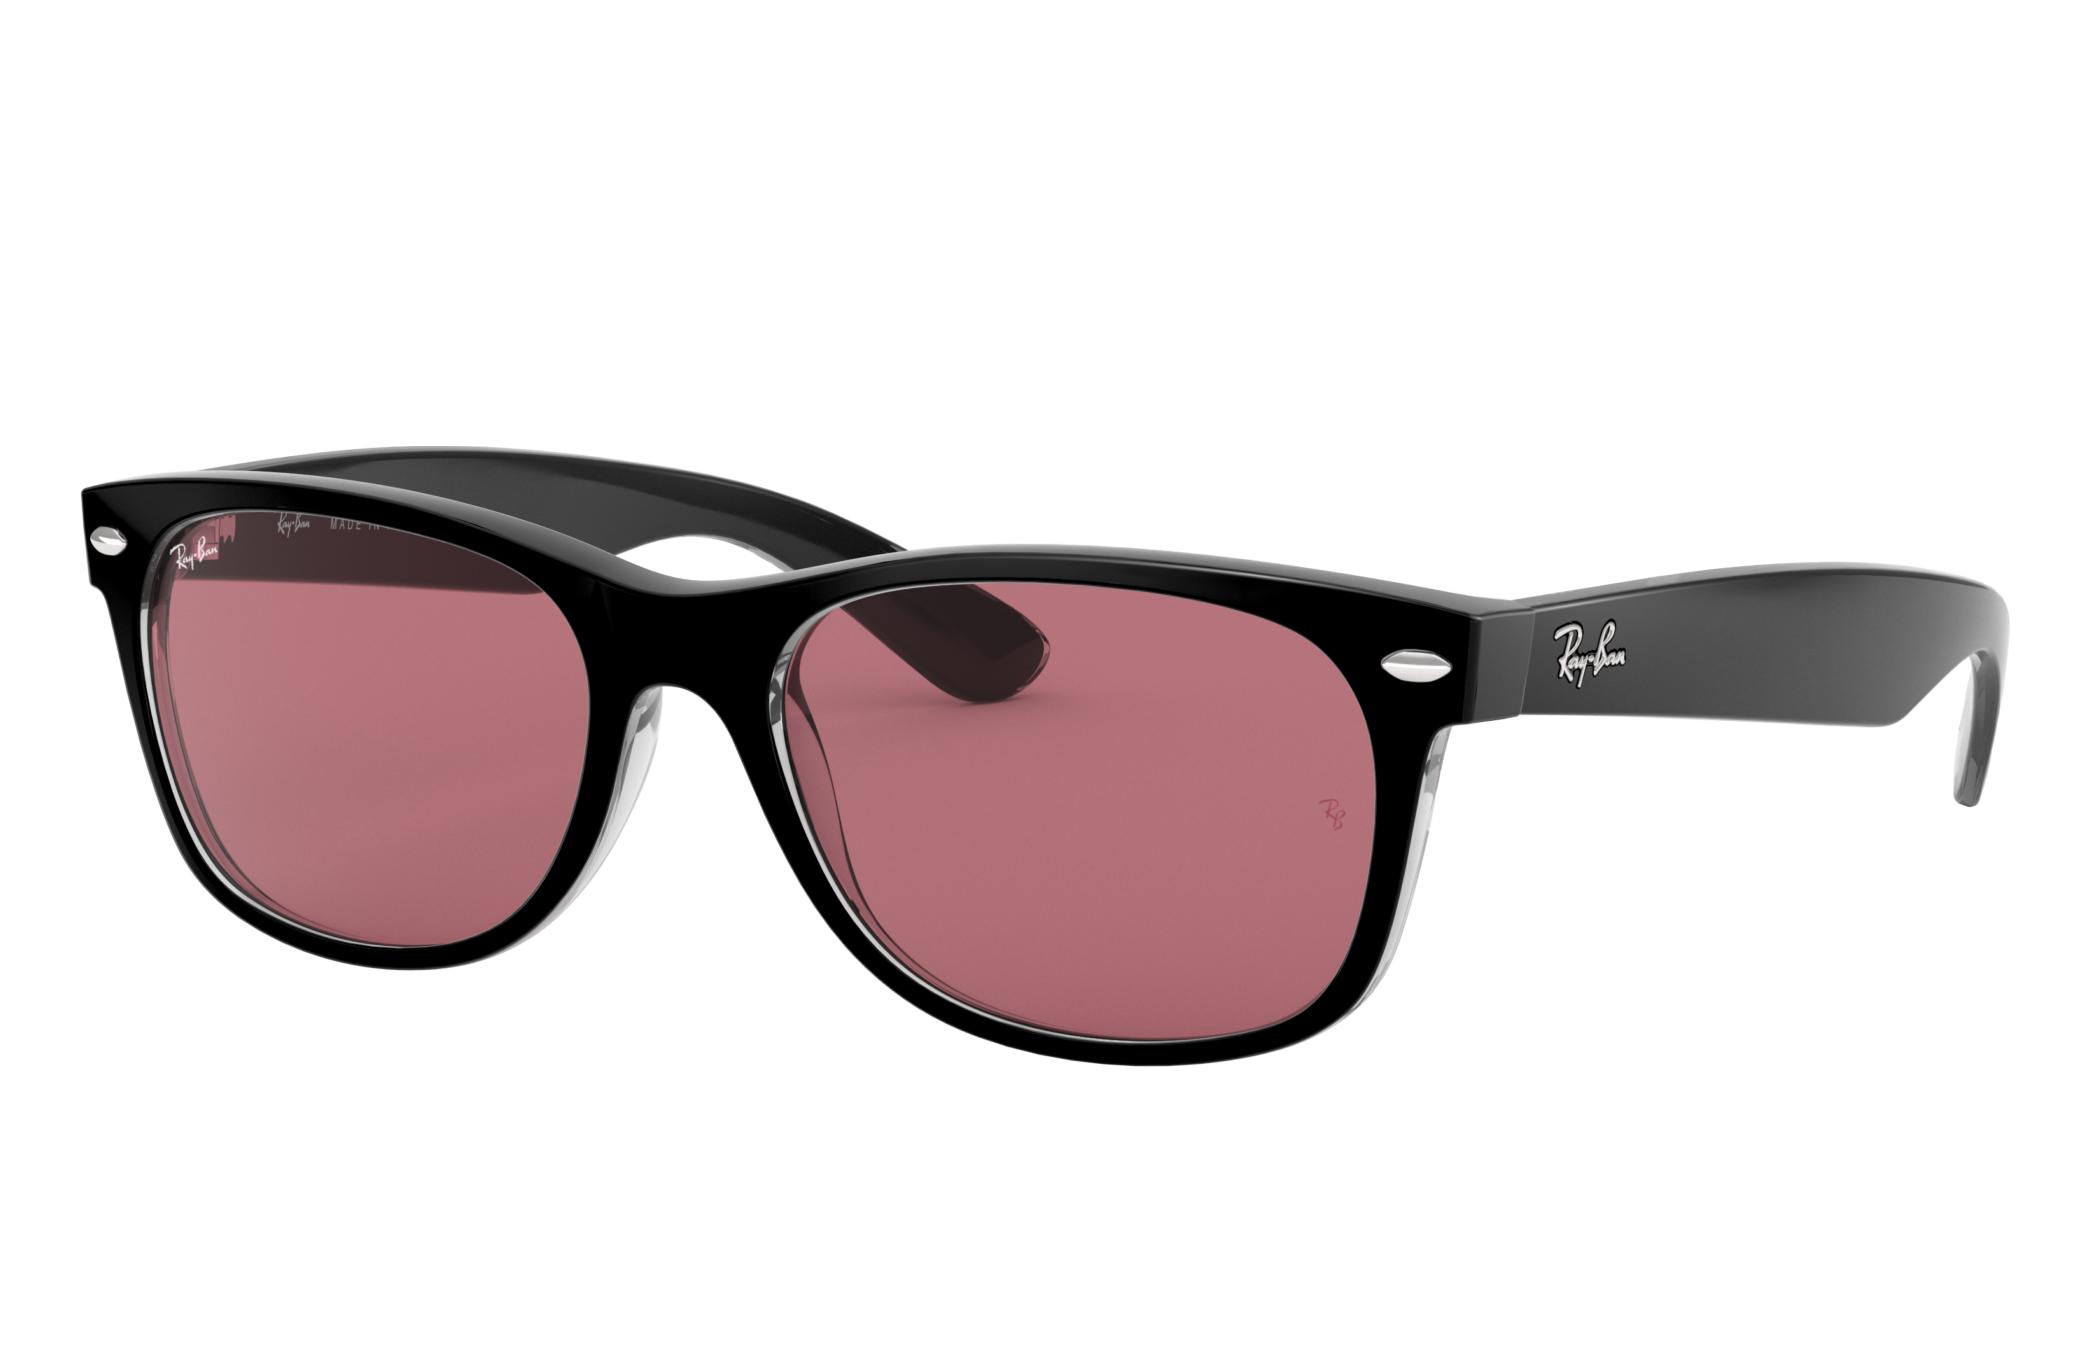 Ray-Ban New Wayfarer Classic Black, Violet Lenses - RB2132